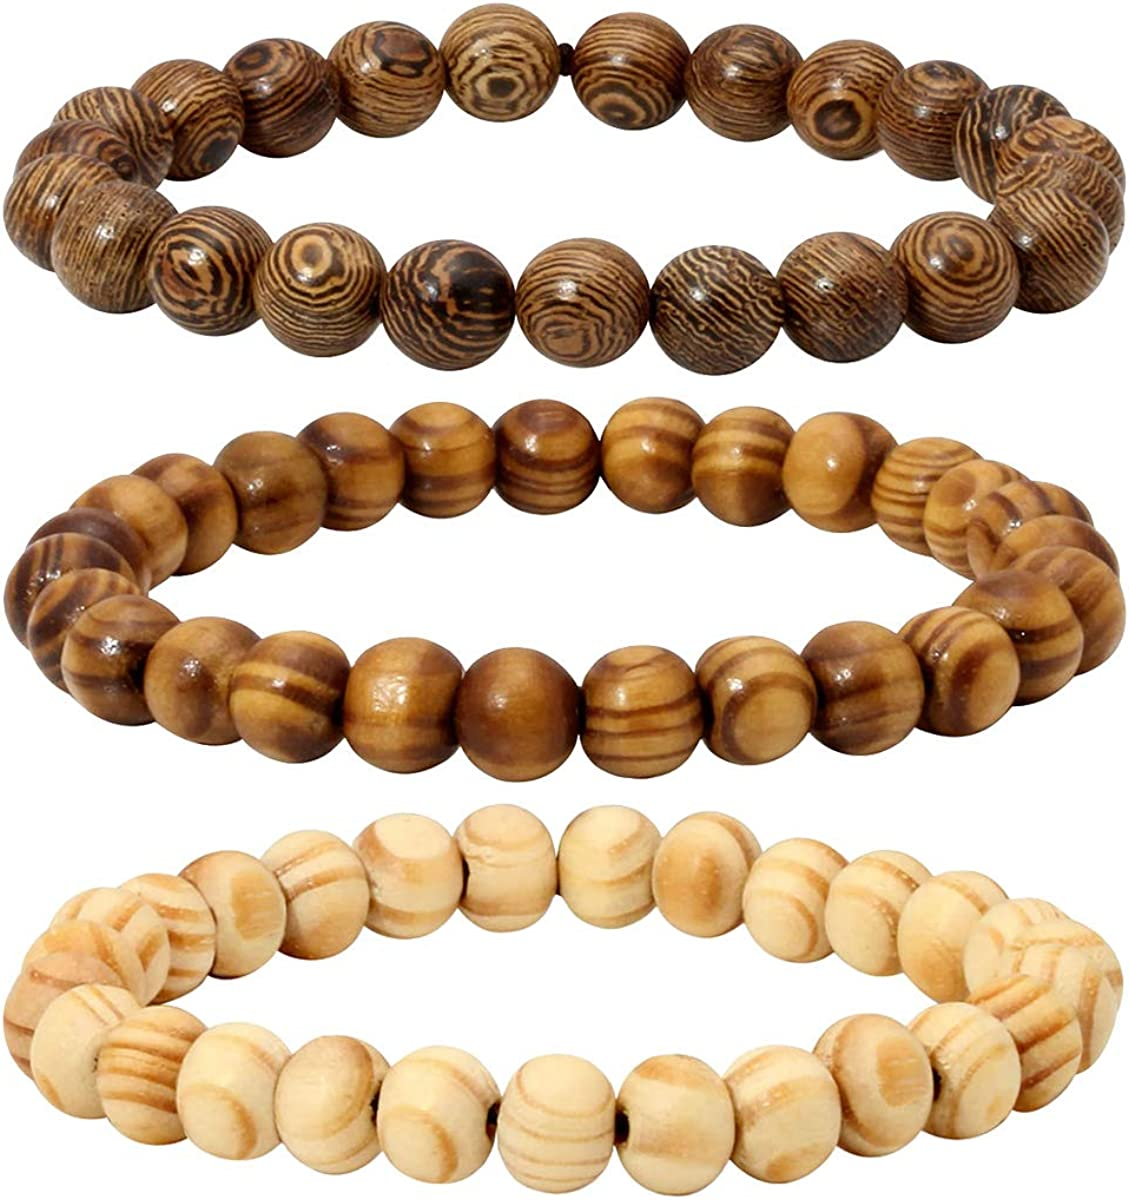 Eigso Wood Bead Bracelet Lava Rock Stone Beads Diffuser Bracelet Gemstone Aromatherapy Bracelet for Men Women